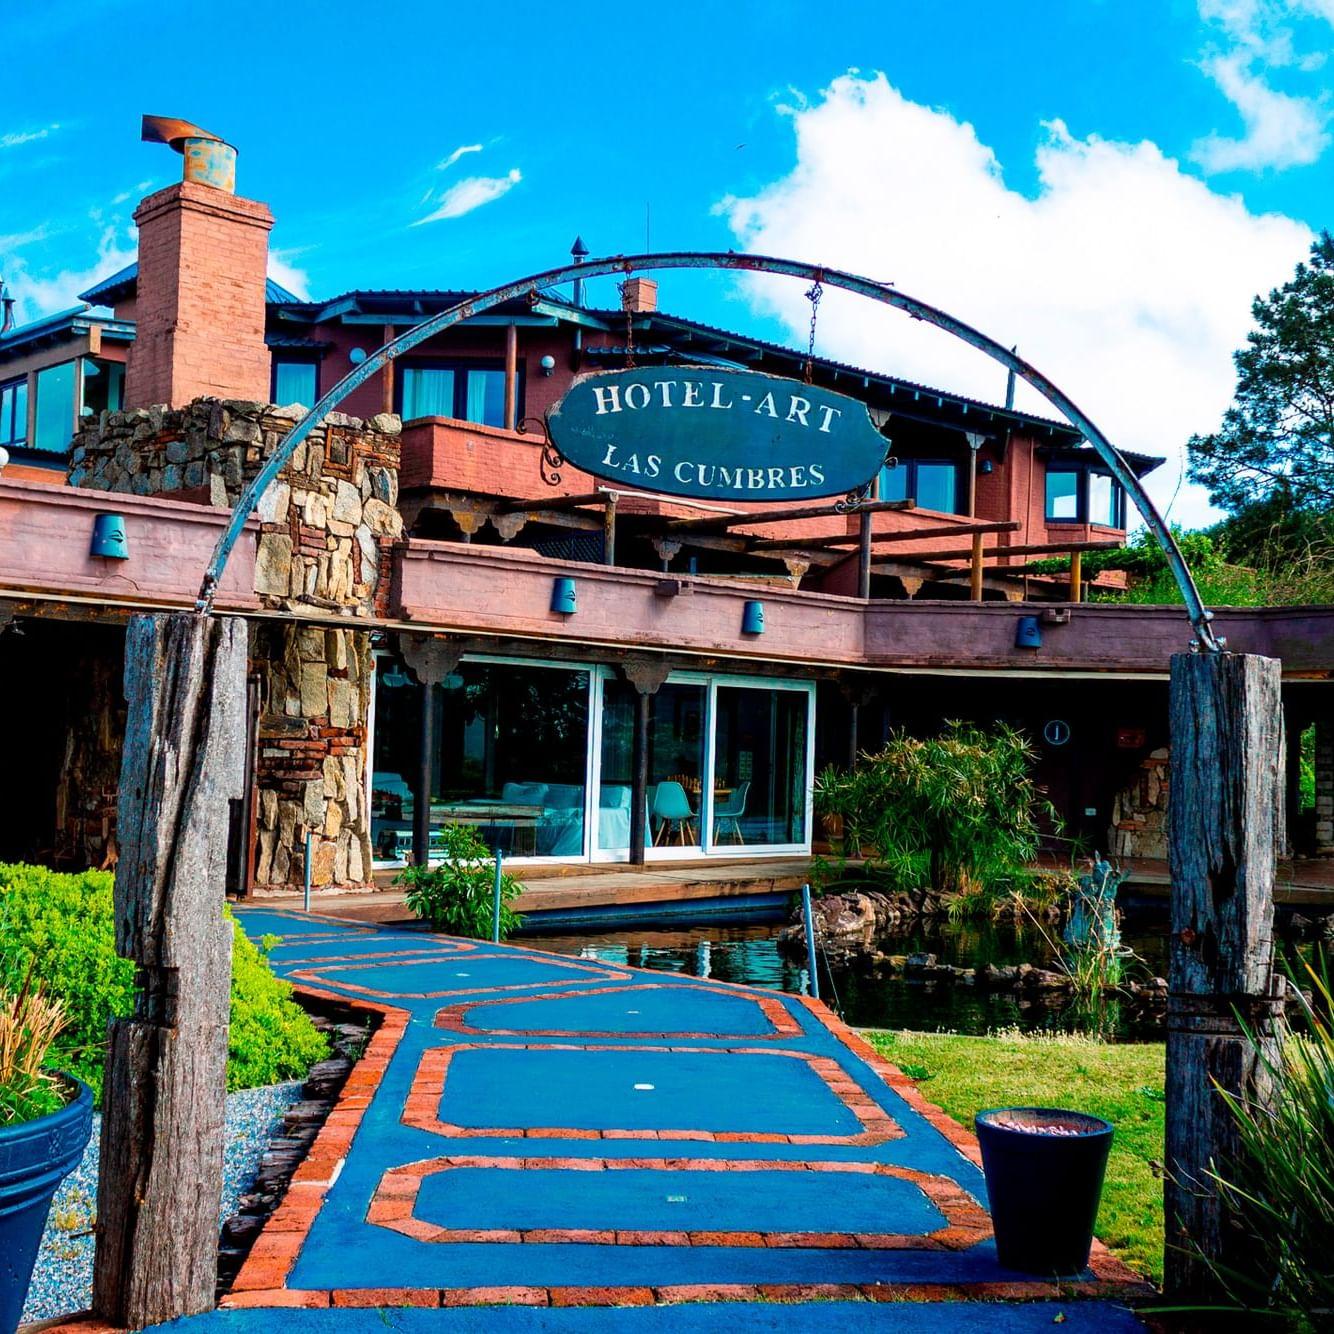 Las Cumbres Hotel Art & Spa